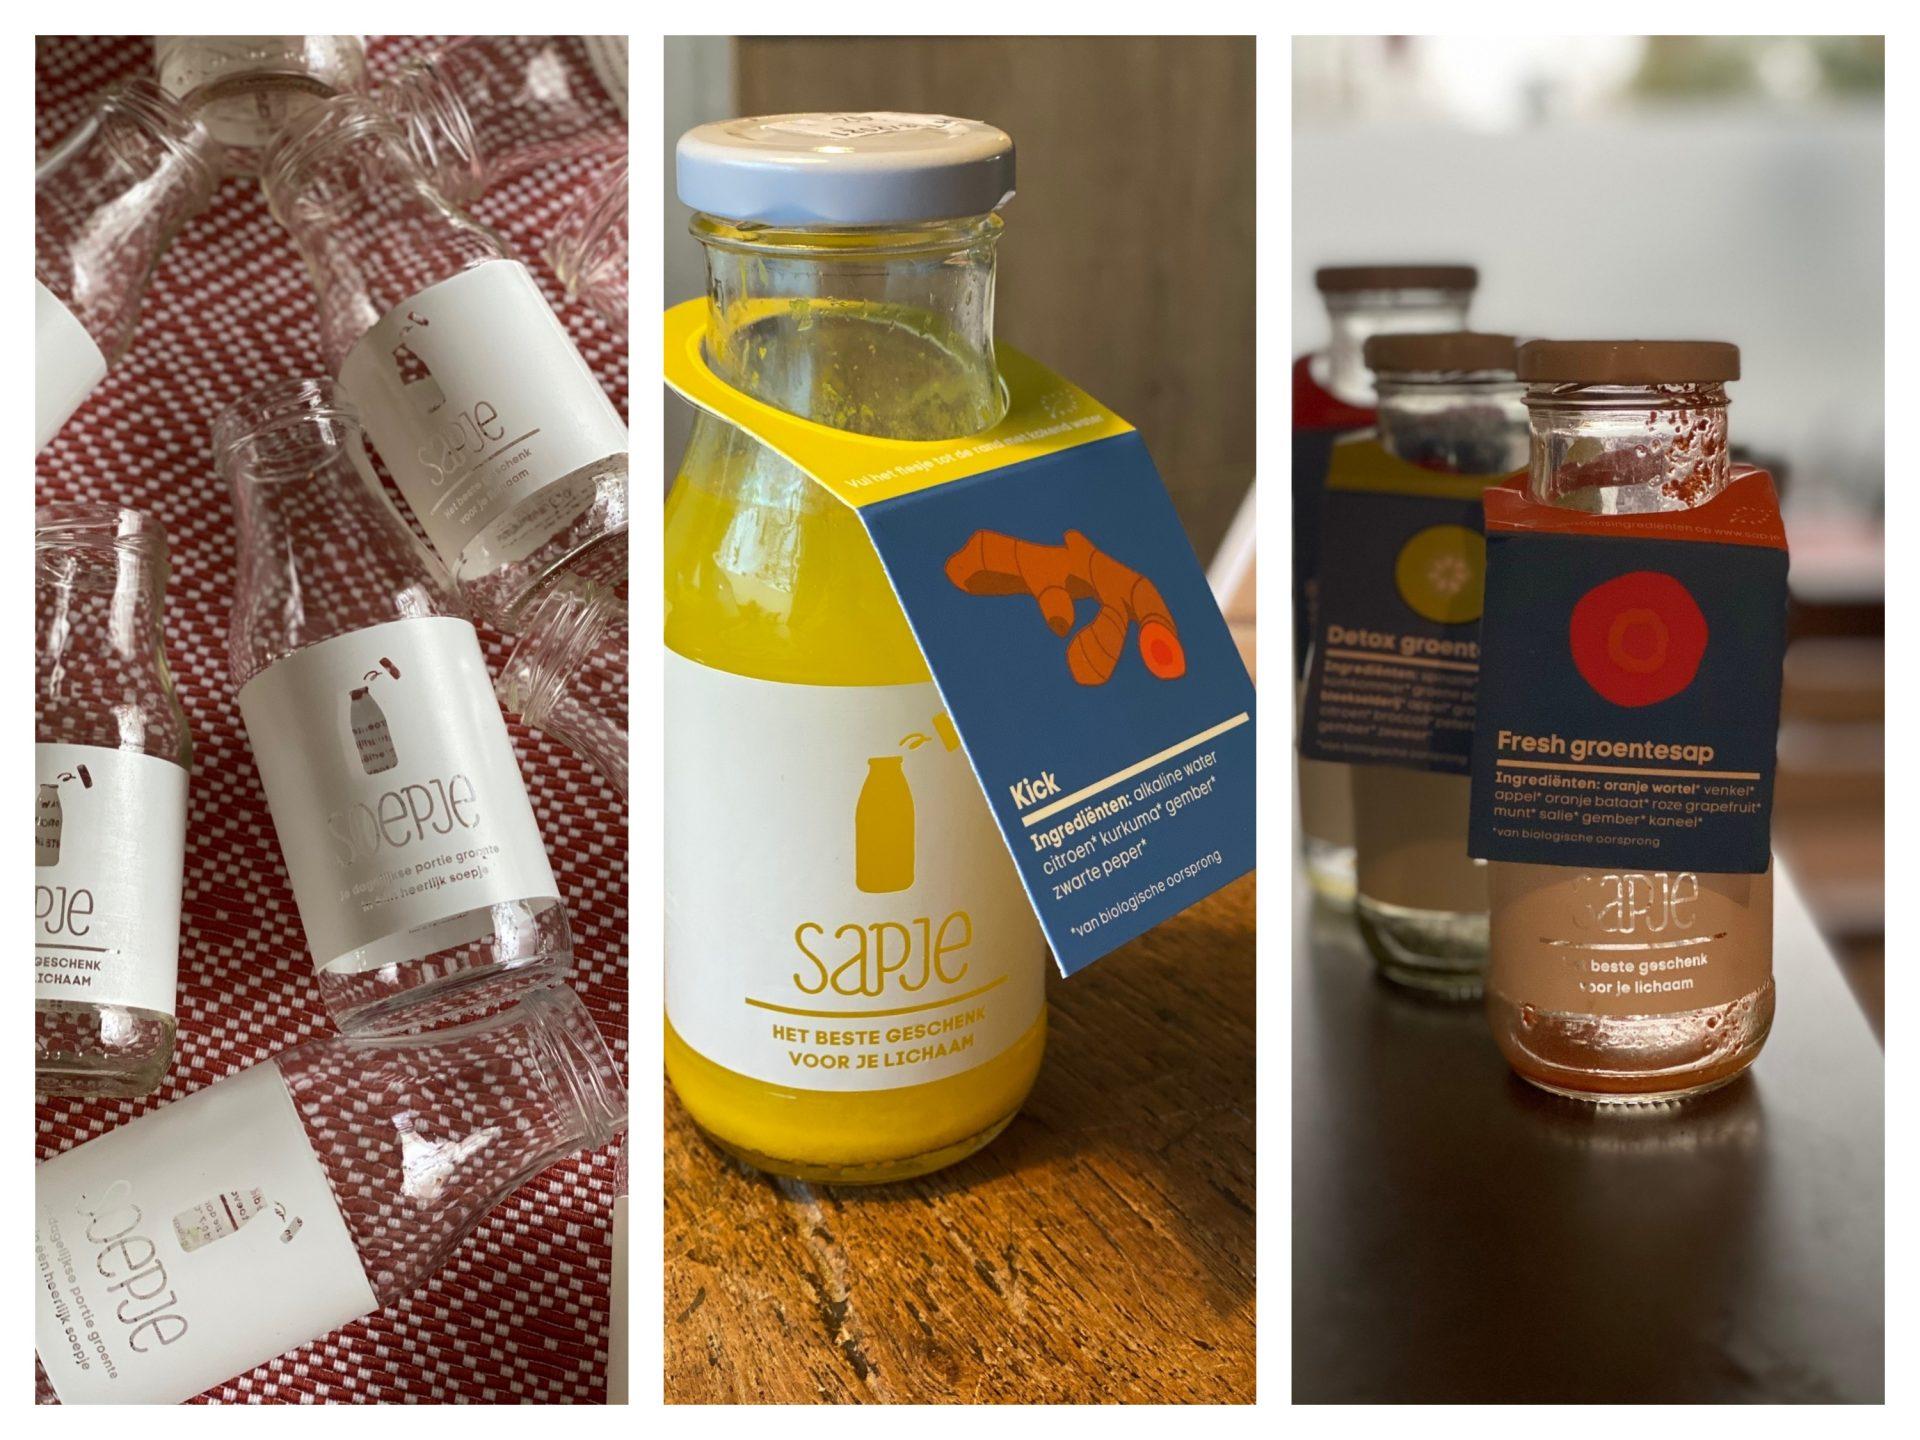 Sapje detox kuur Collage - Foodblog Foodinista